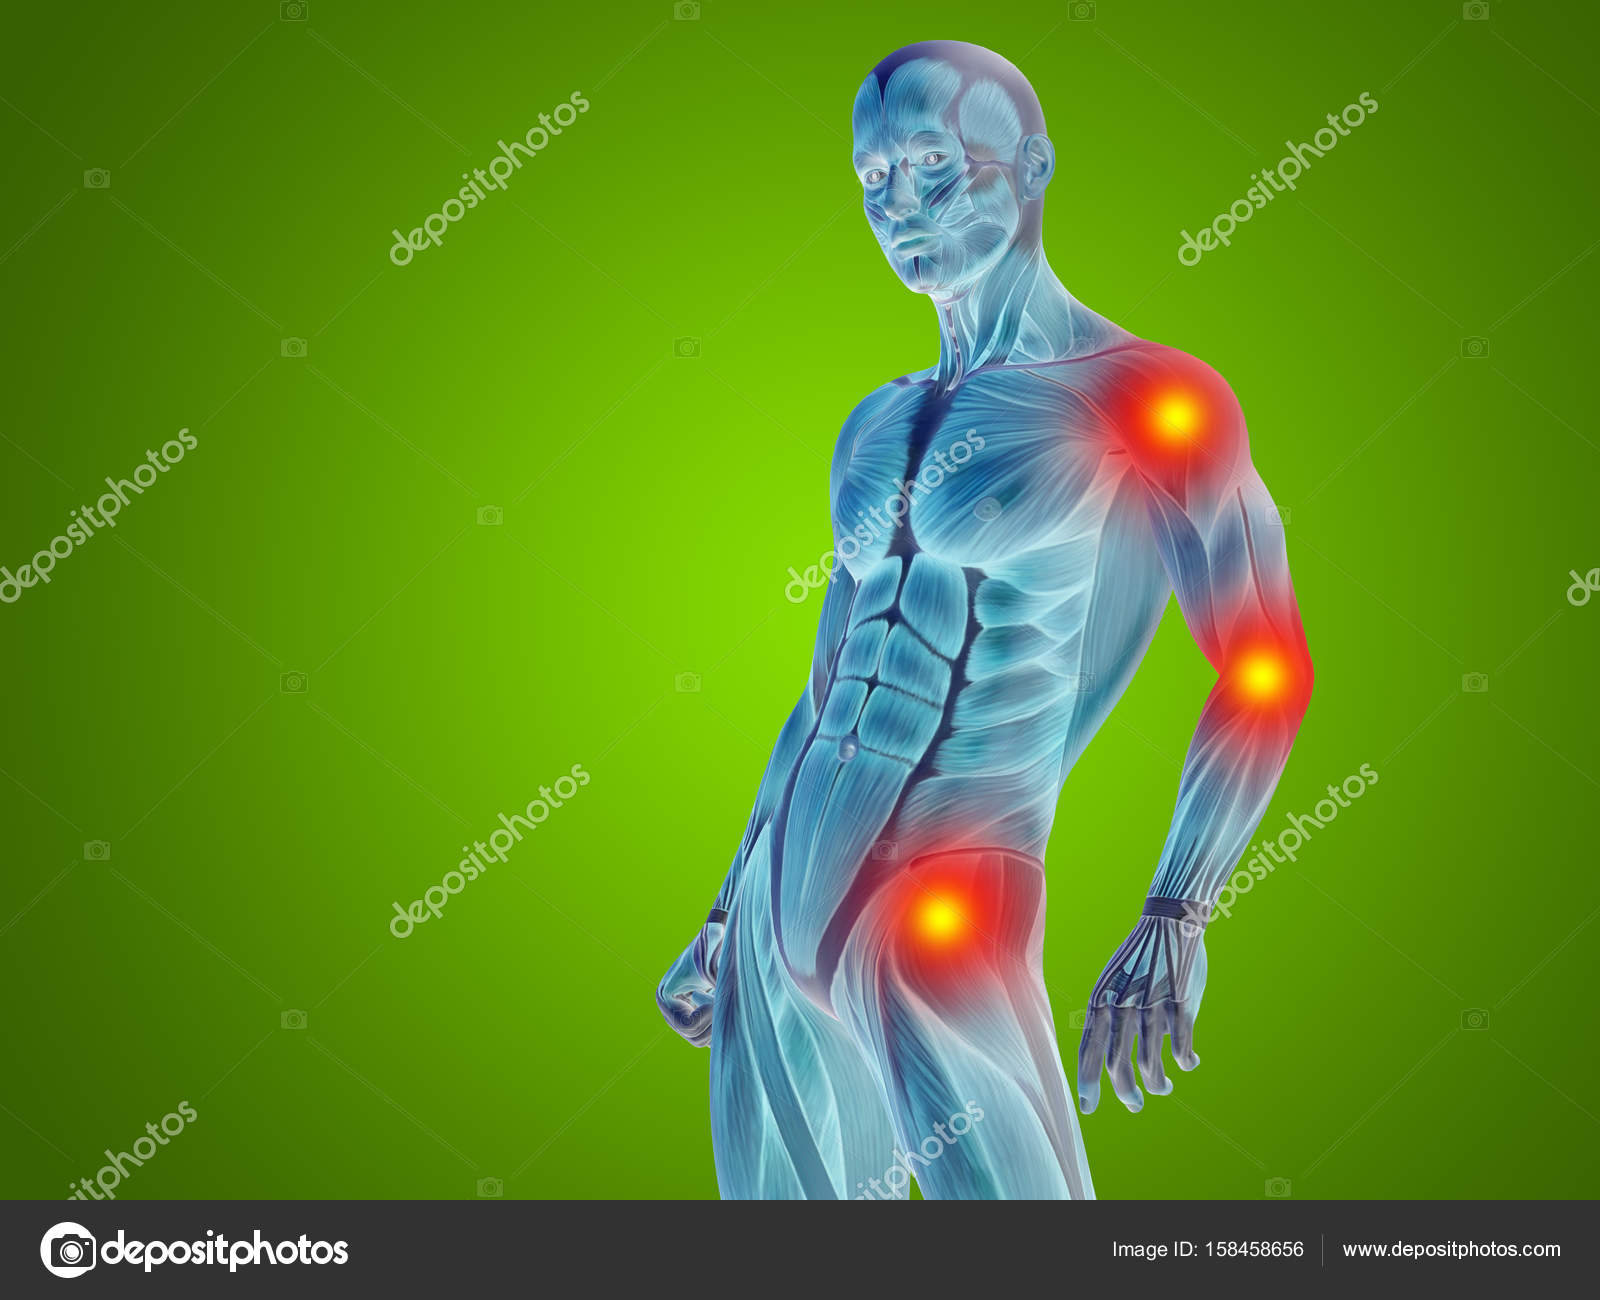 Human Man Anatomy Upper Body Stock Photo Design36 158458656